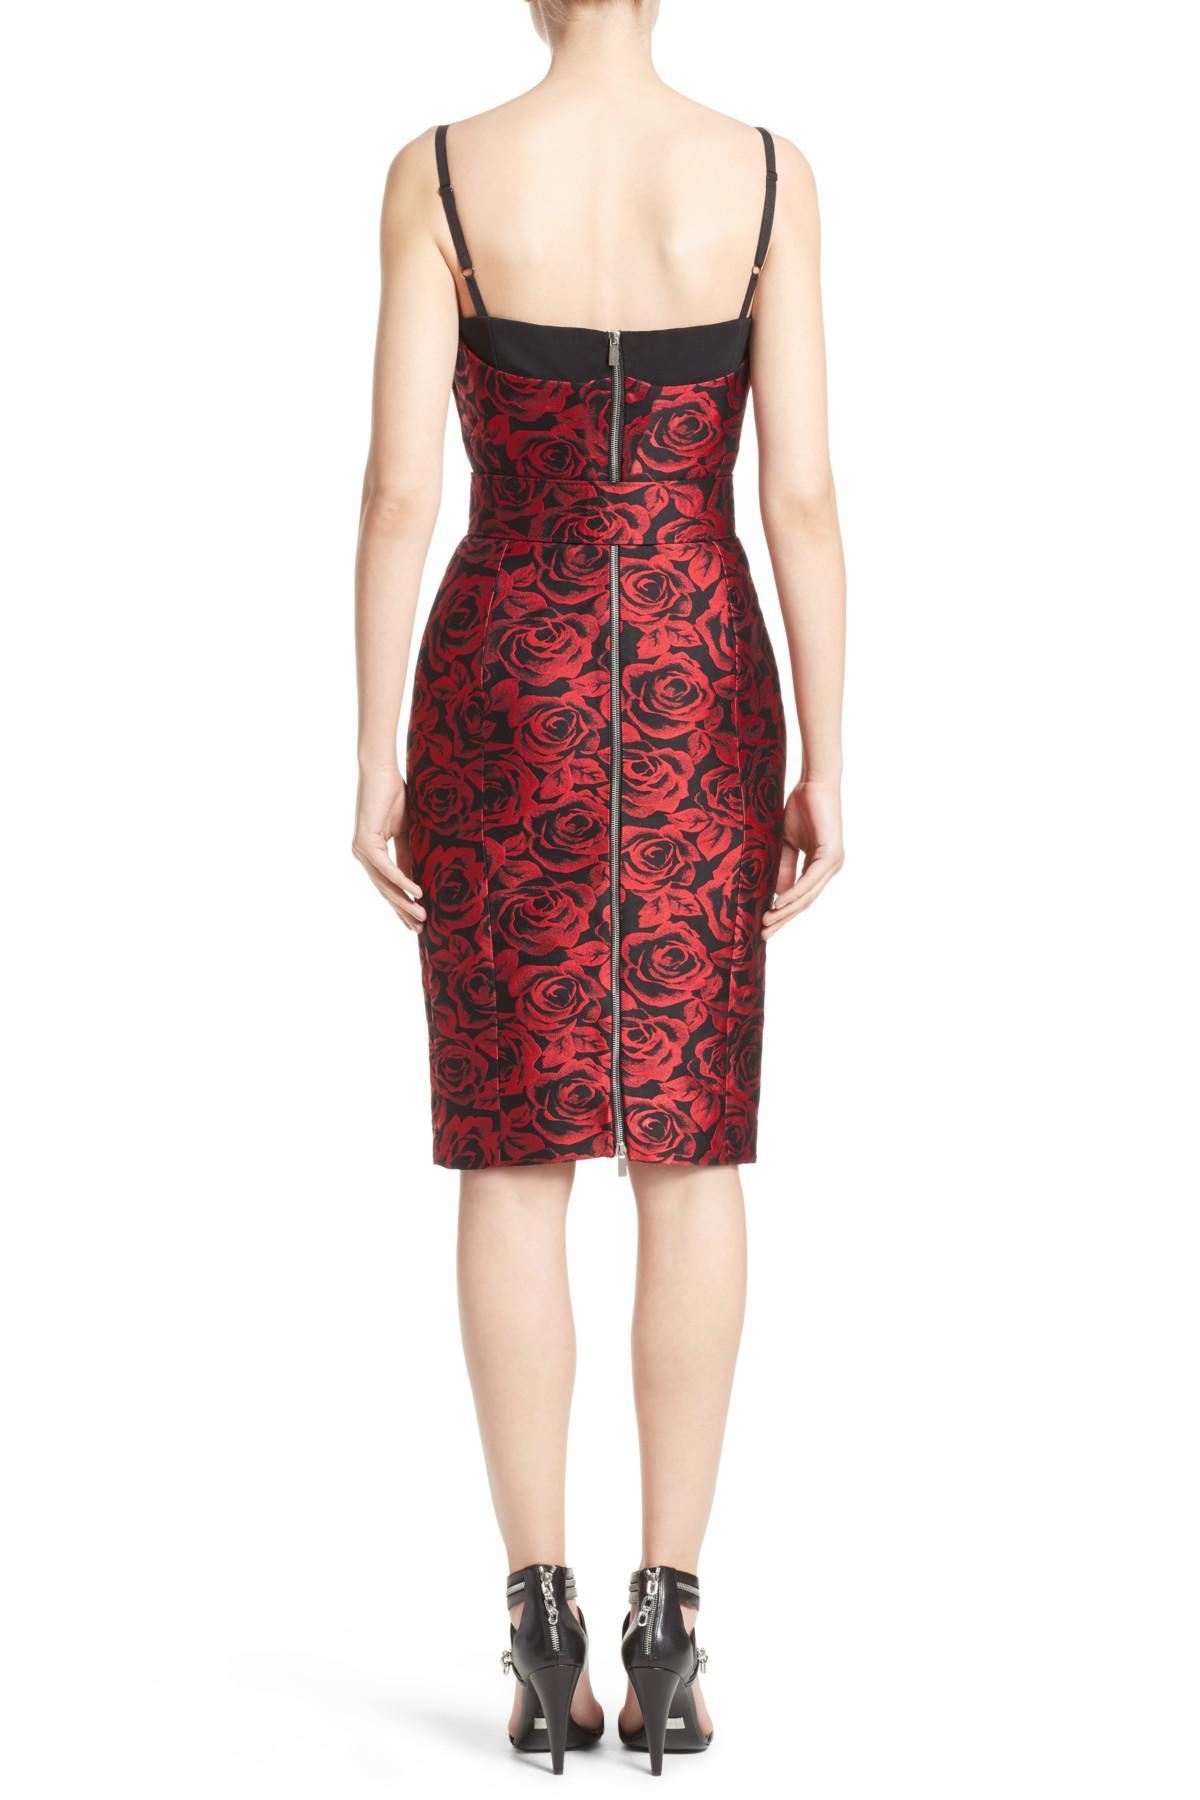 4ba71785584 Lyst - Michael Kors Rose Jacquard Bustier Sheath Dress in Red